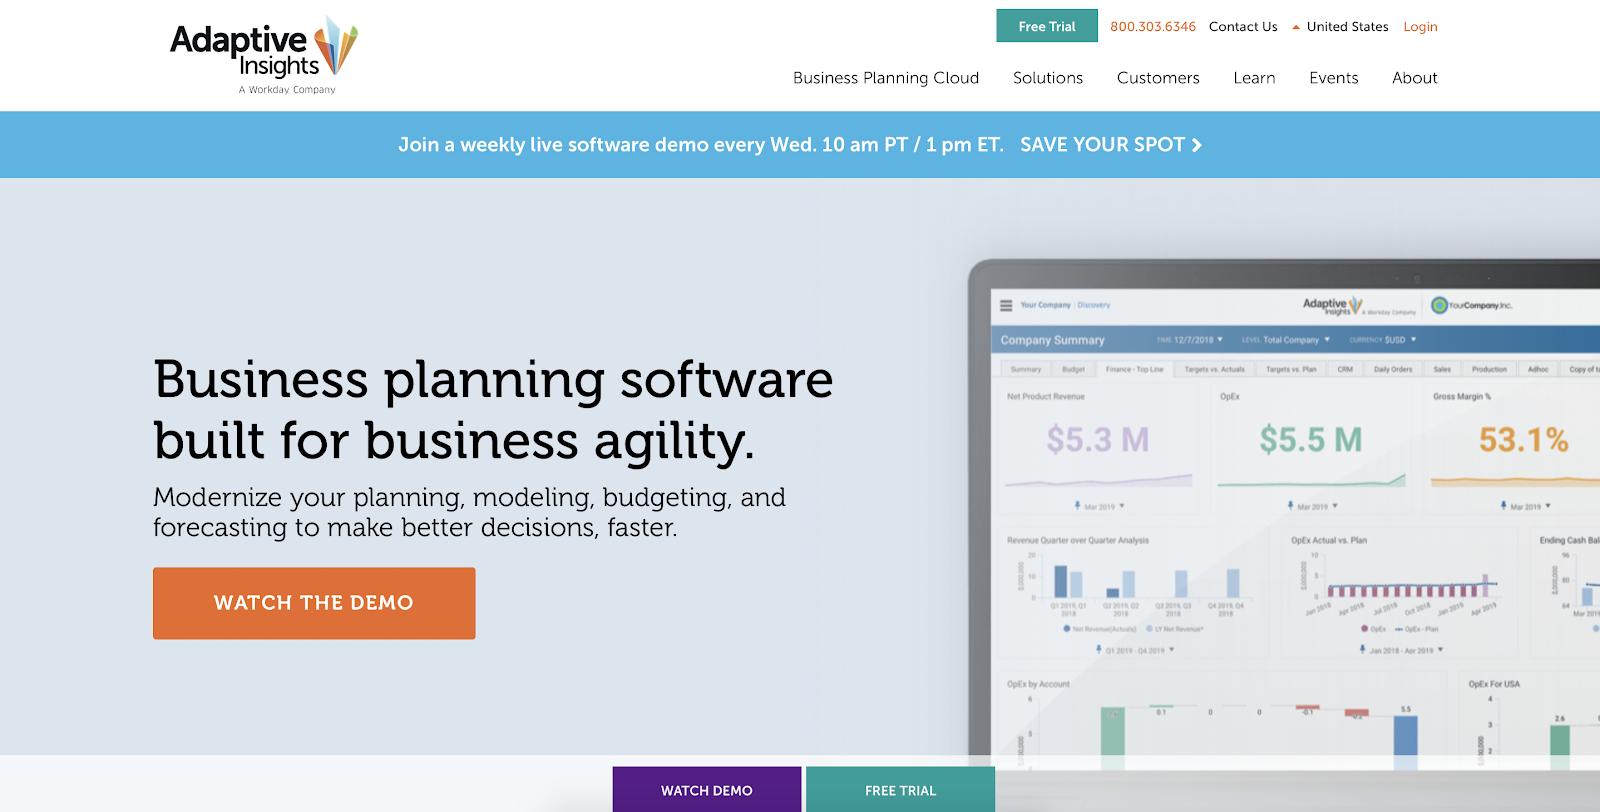 SaaS analytics tools: Adaptive Insights